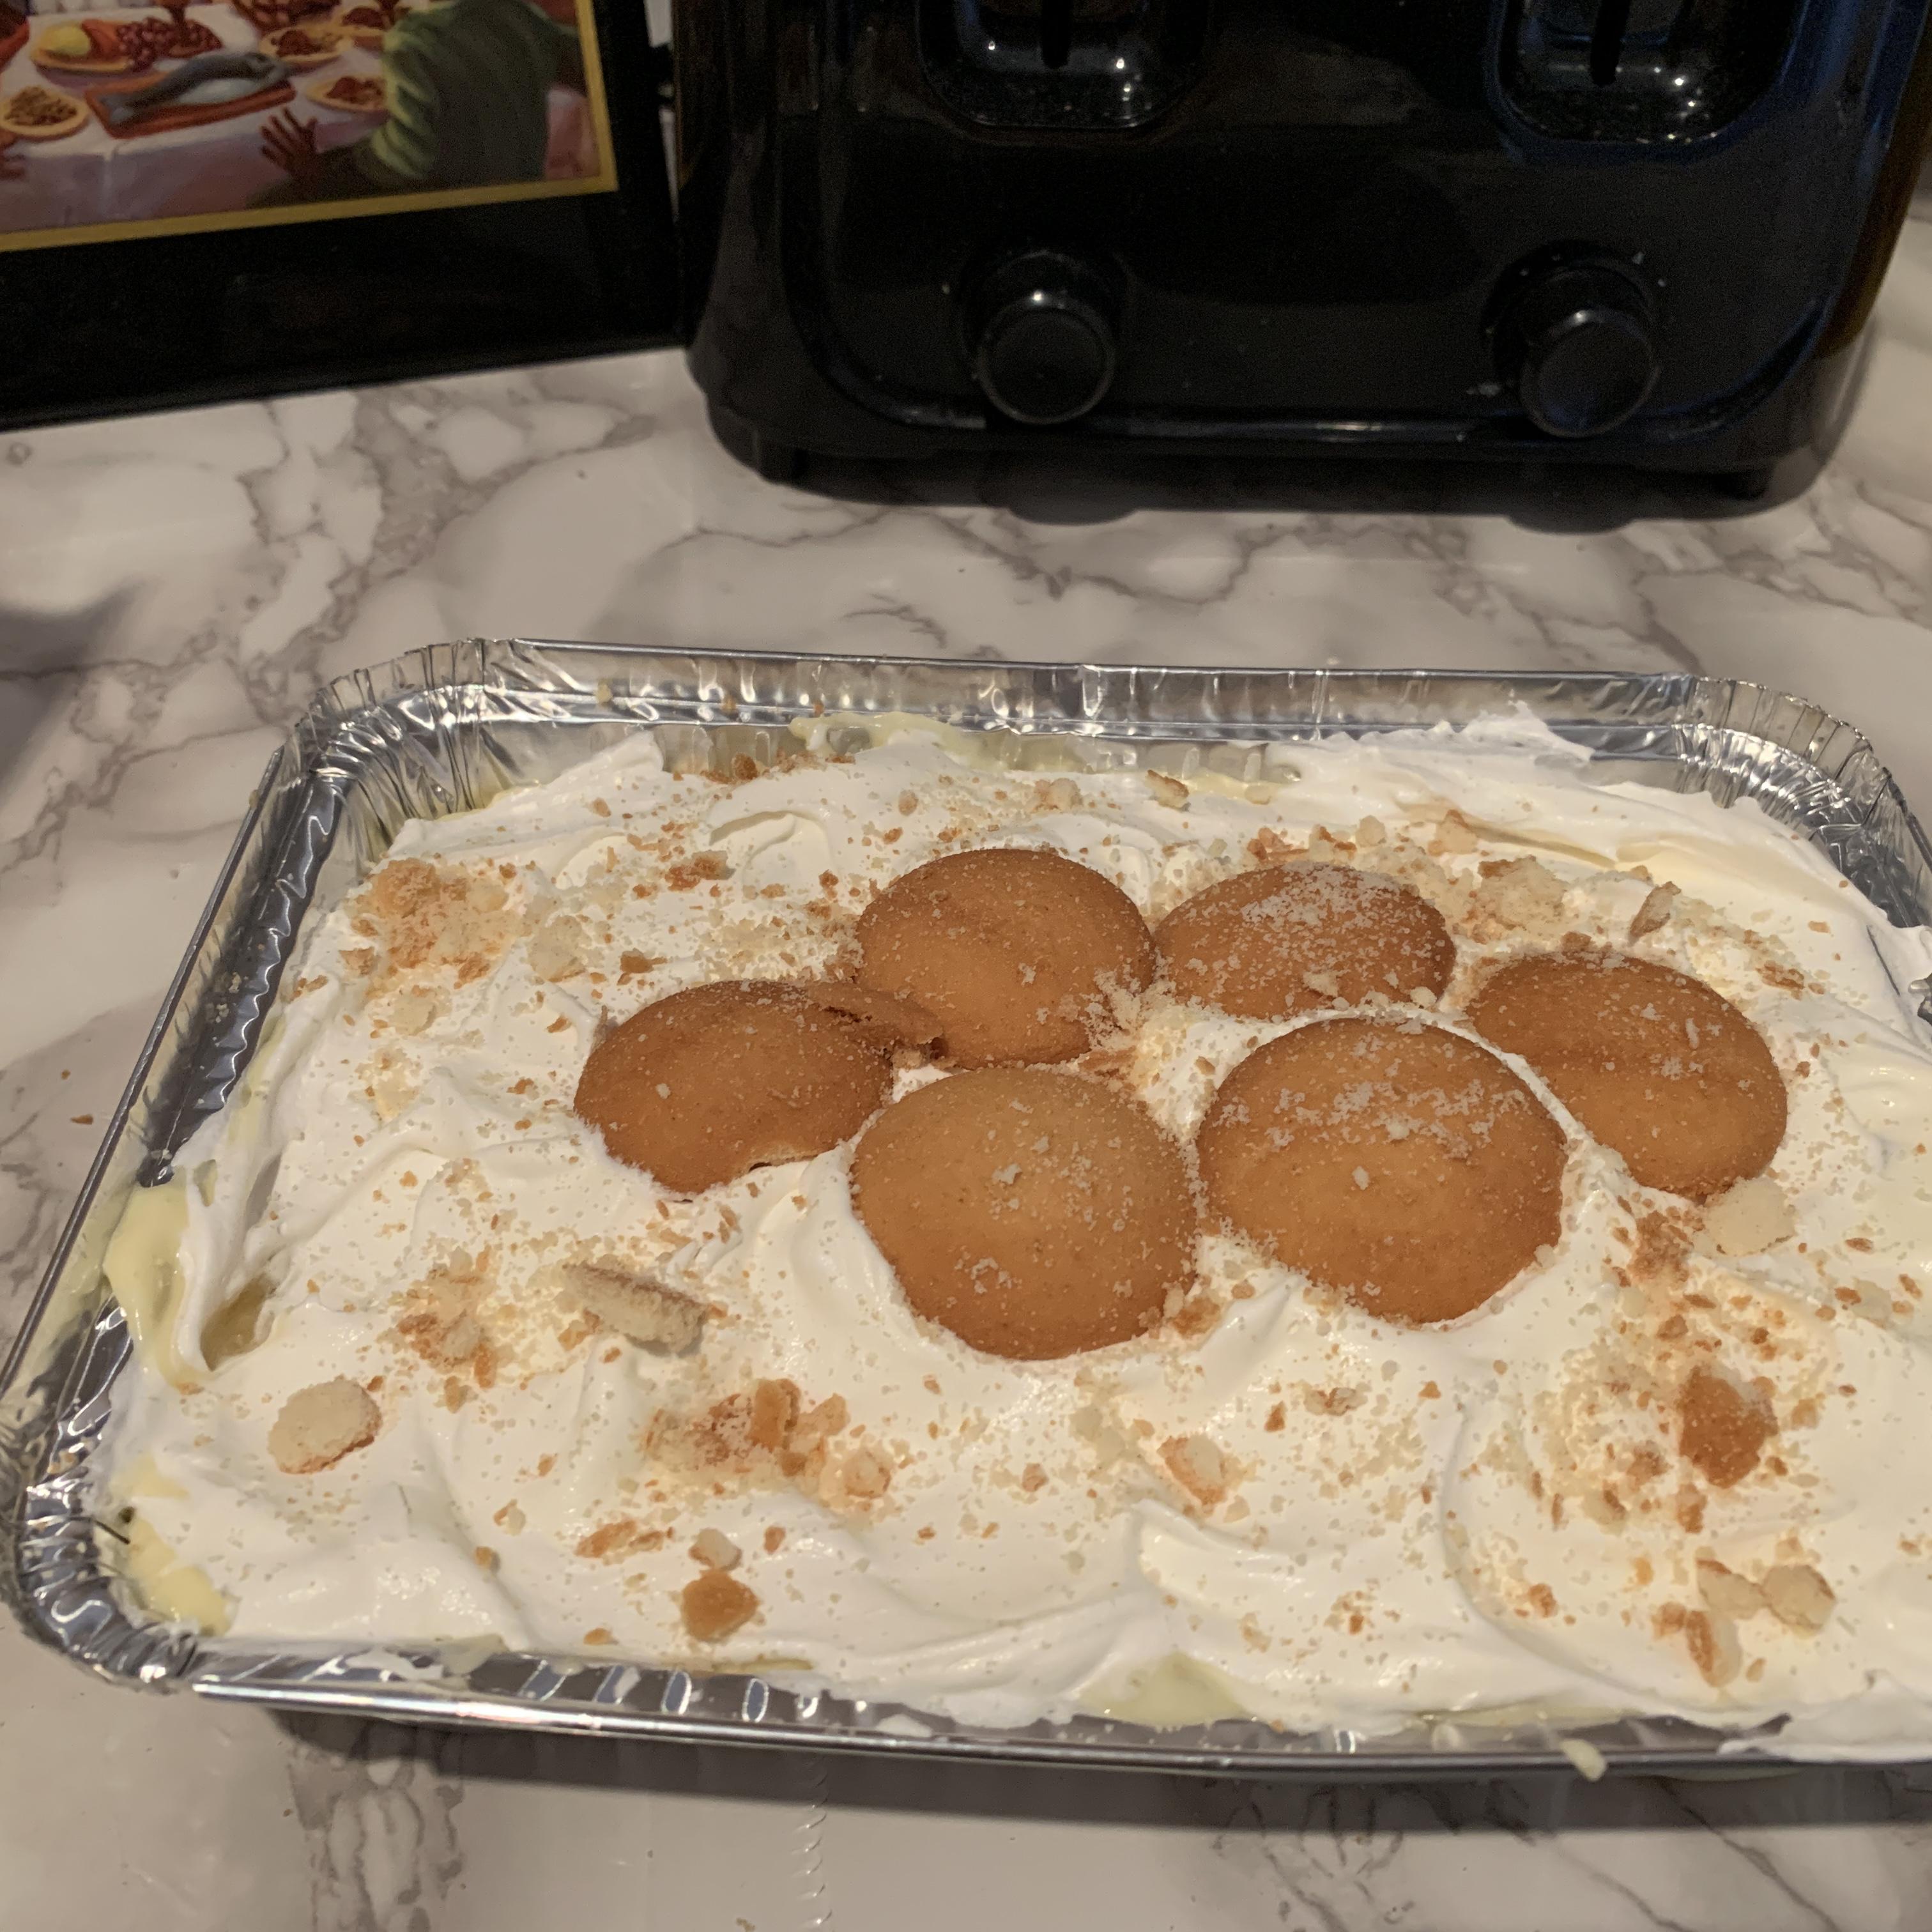 Aunt Betty's Banana Pudding